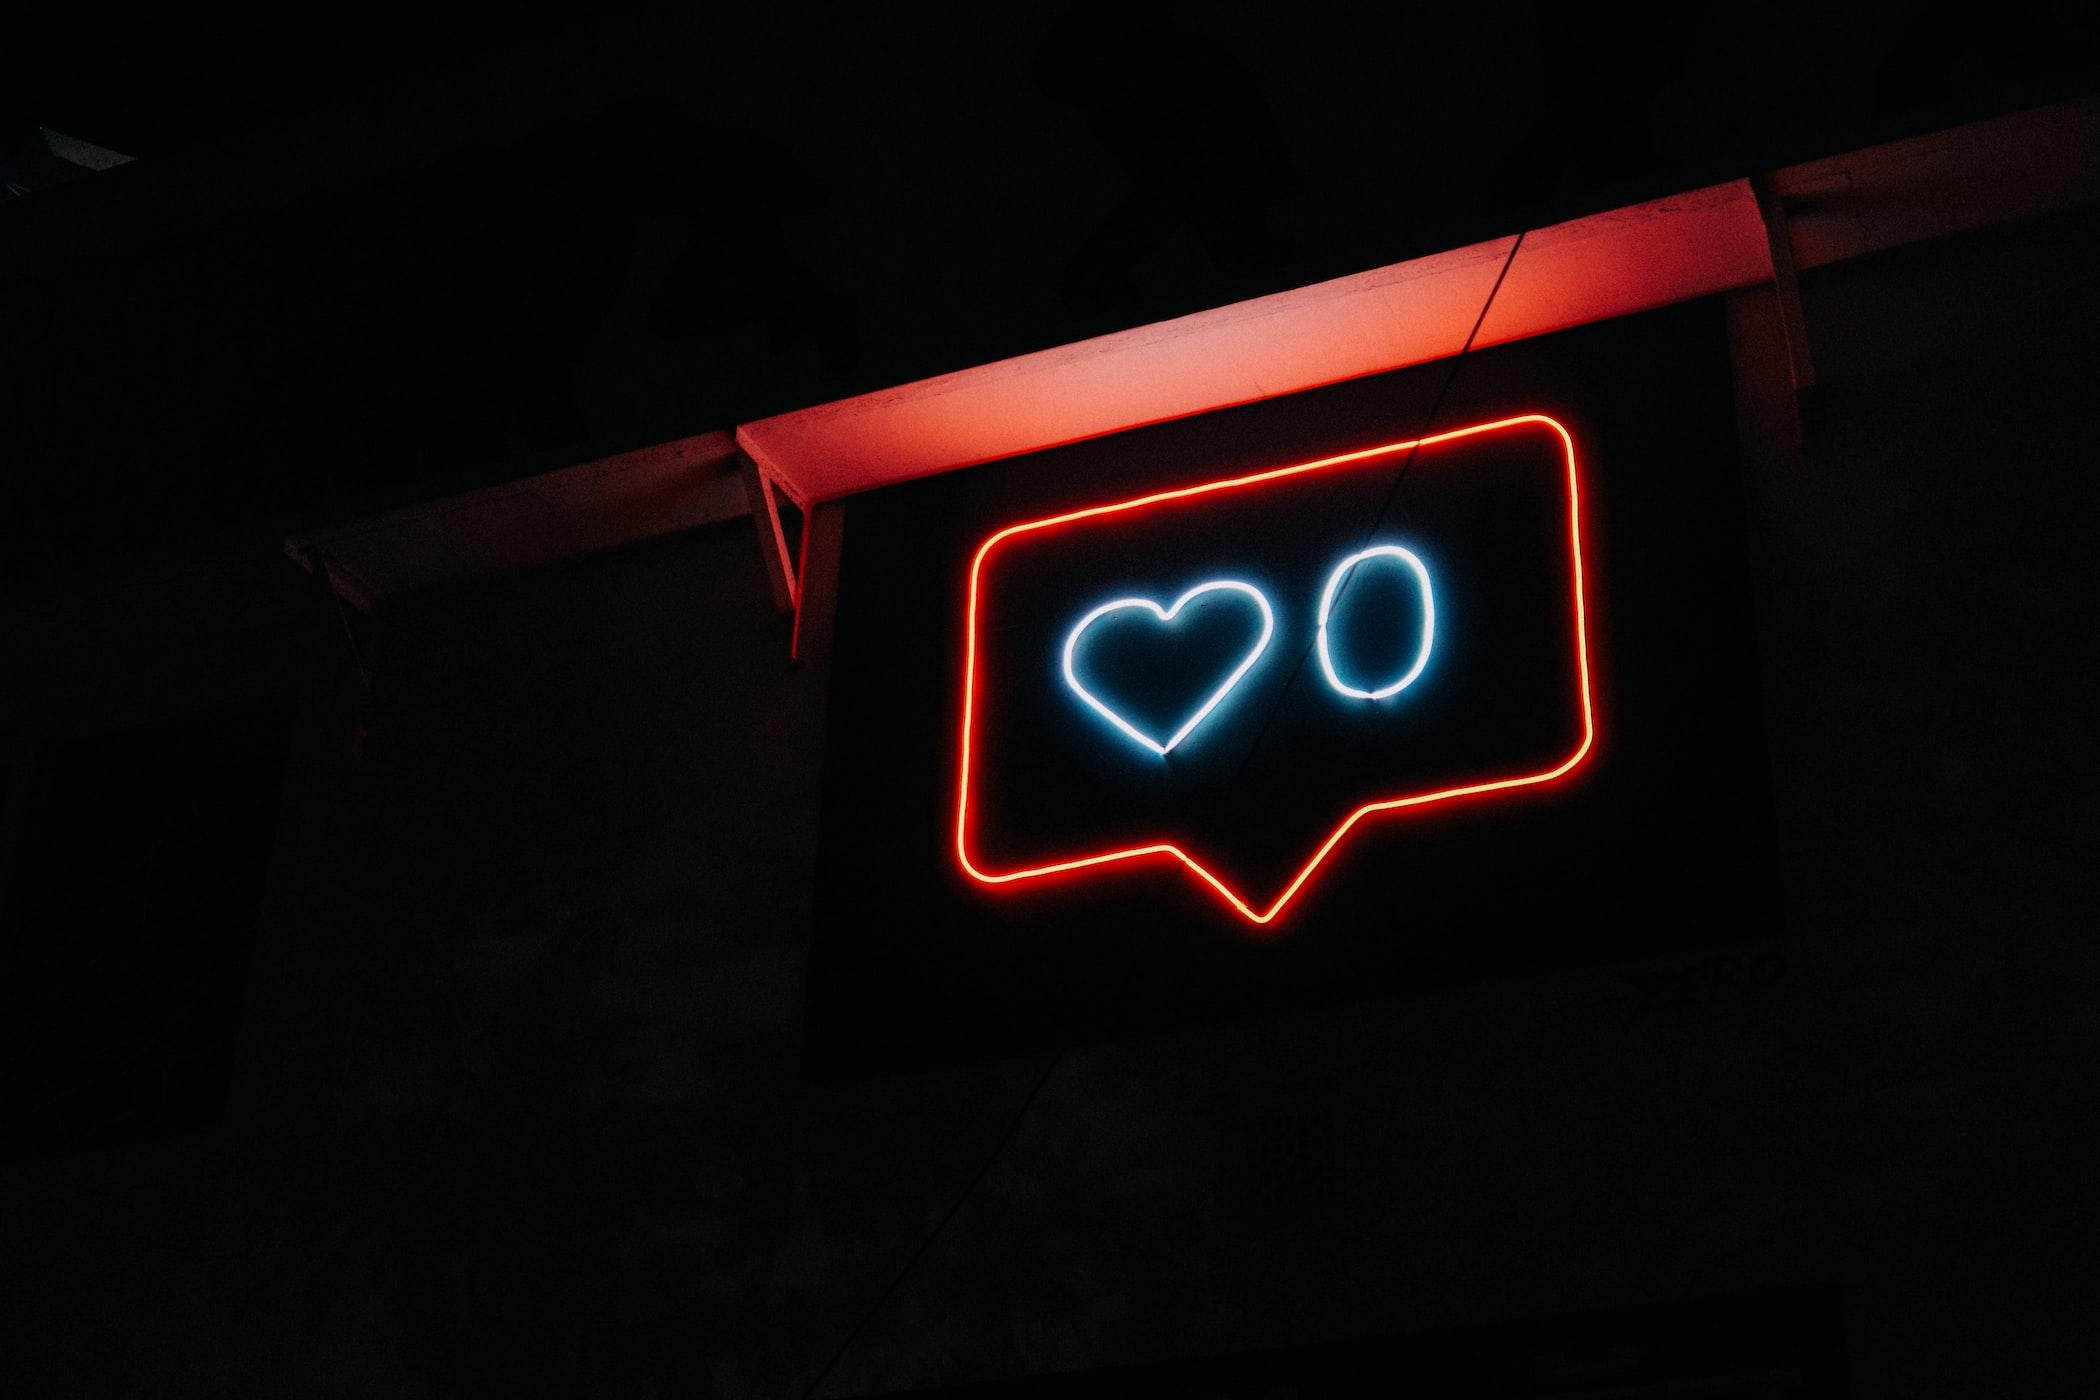 Neon instagram likes symbol.